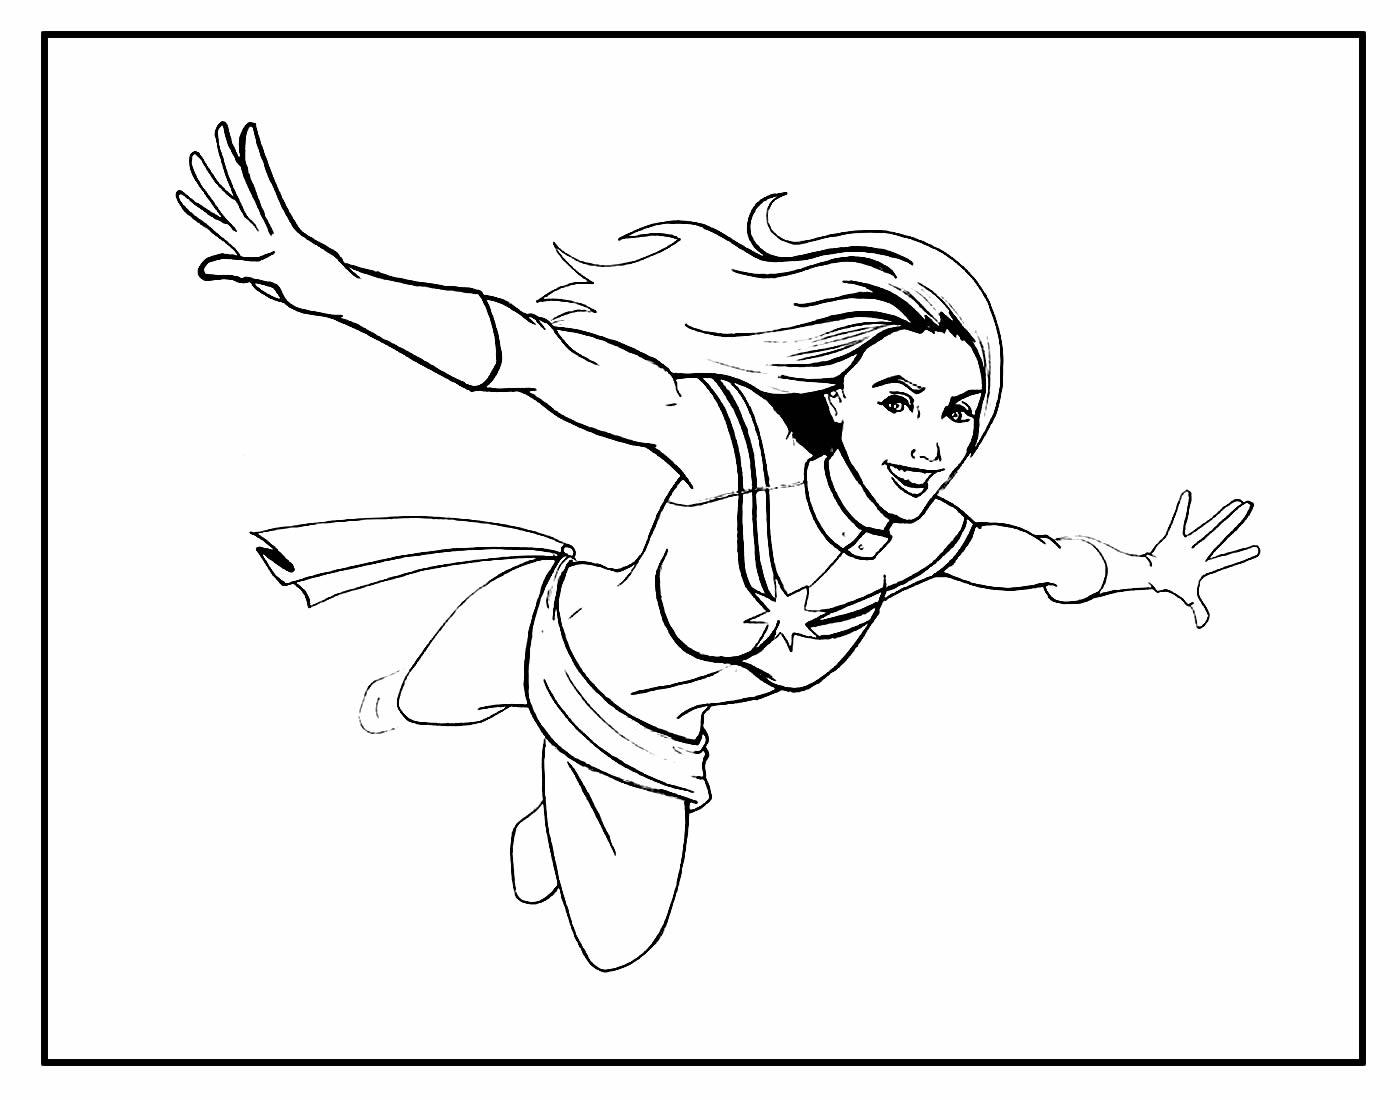 Página para colorir da Capitã Marvel